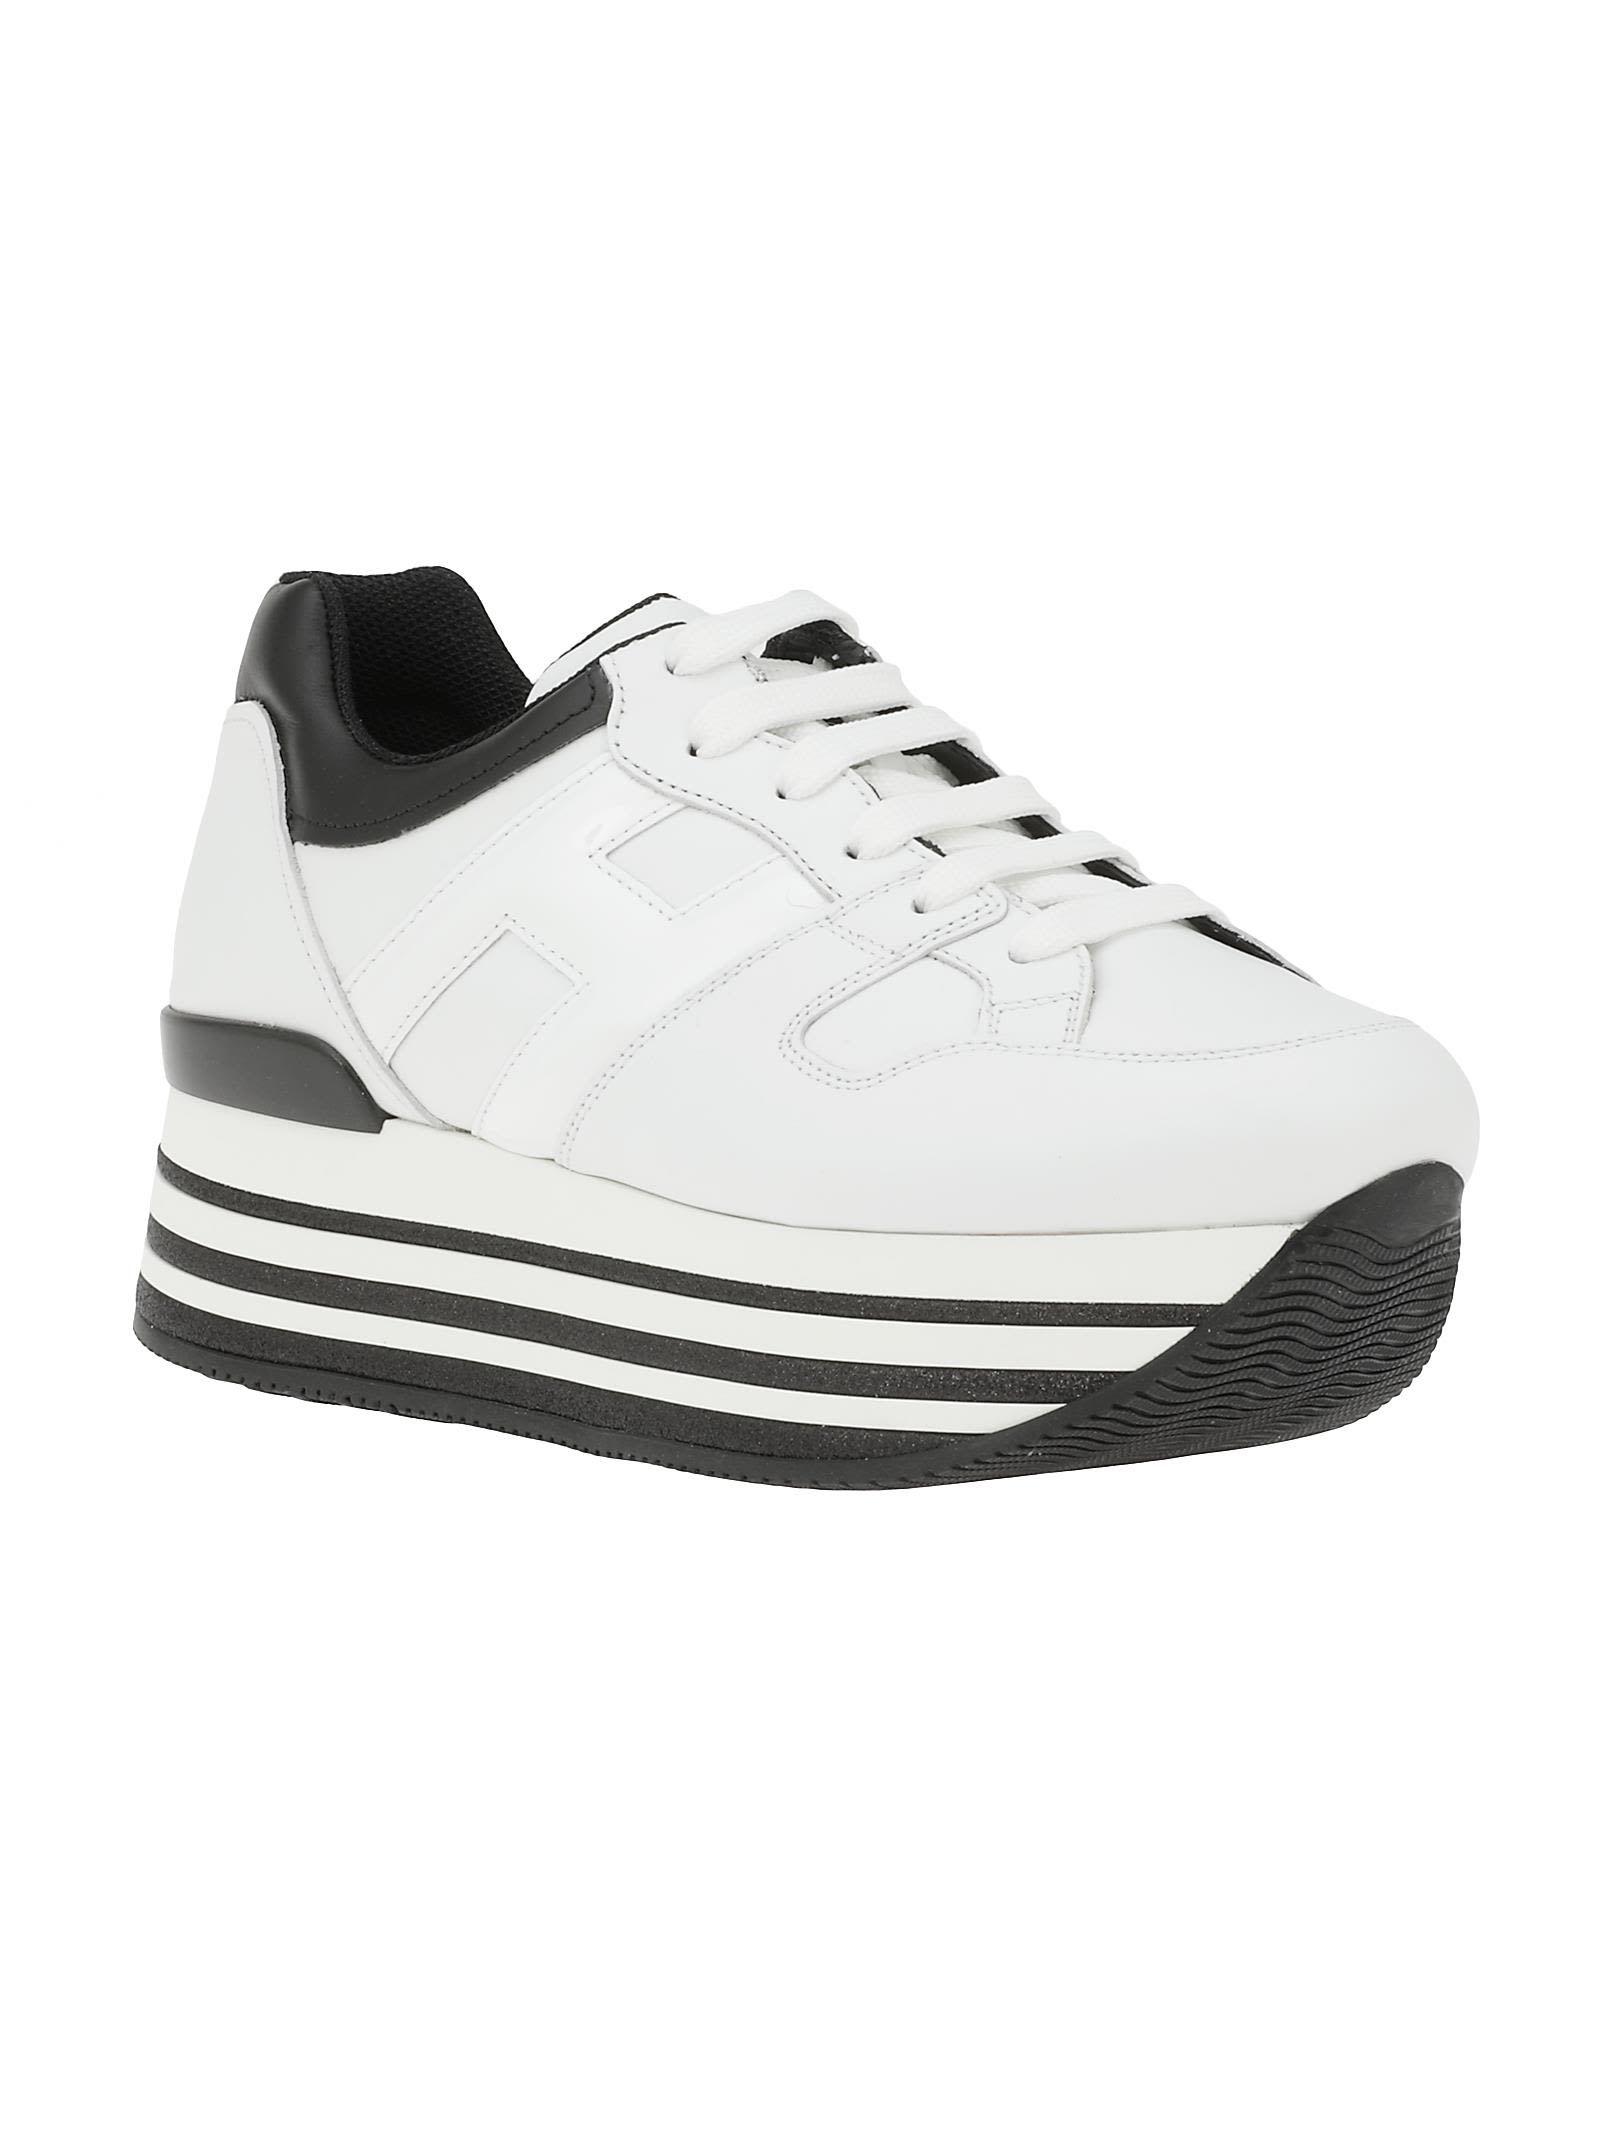 Hogan Hogan Hogan H368 Sneaker Shoes Sneakers Hogan Fashion Adidas Sneakers Sneakers Shoes